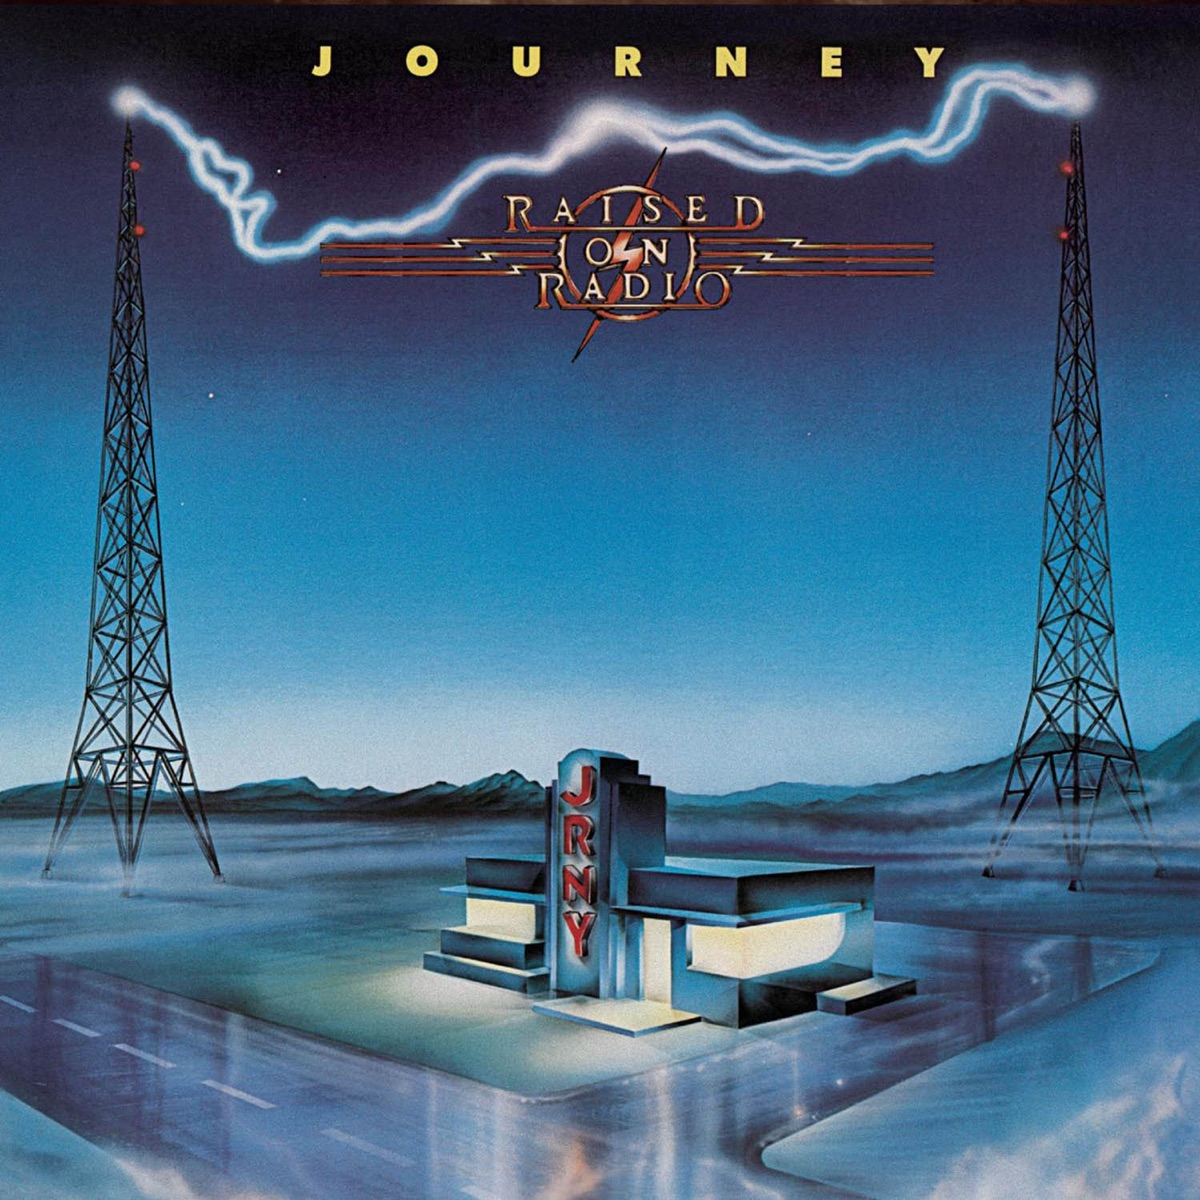 Raised On Radio Journey CD cover